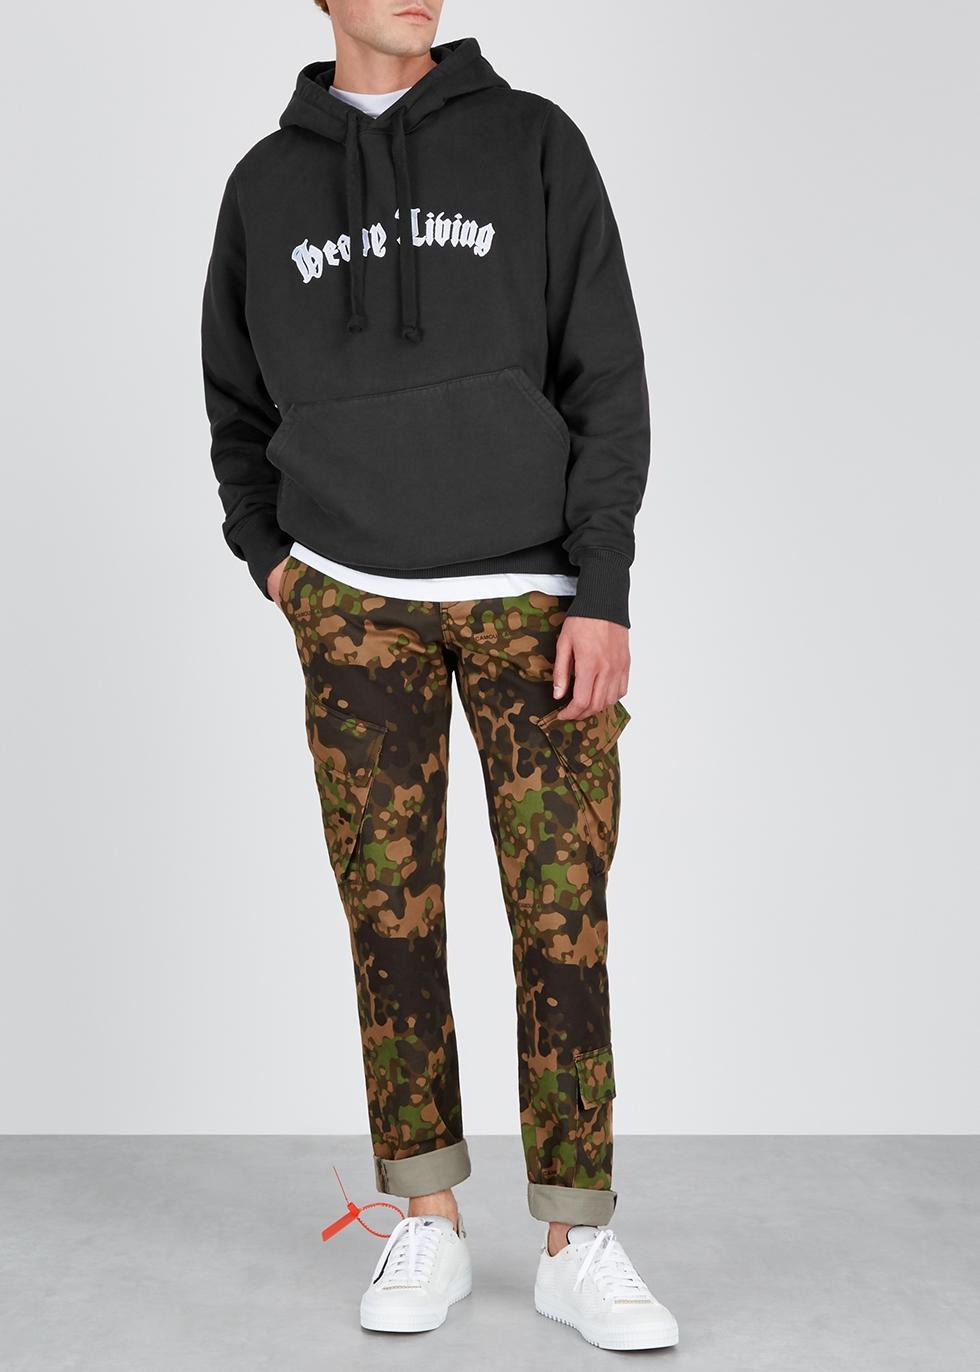 Heavy Living anthracite cotton sweatshirt - Last Heavy